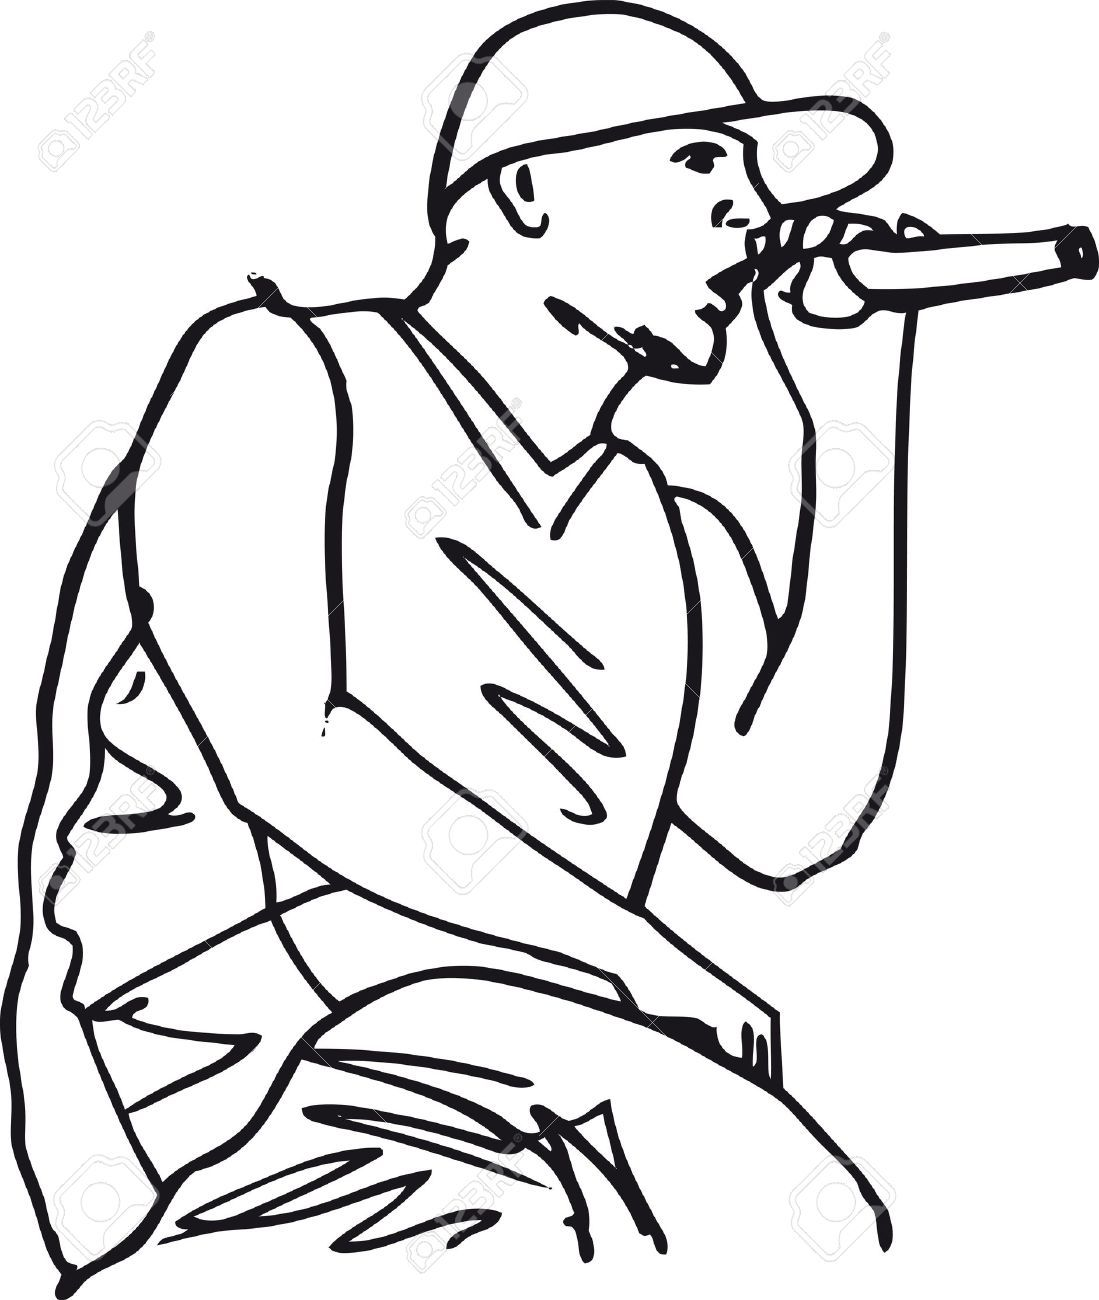 Illistration Hip Hop Google Search Coloring Pages Cartoon Clip Art Vector Illustration